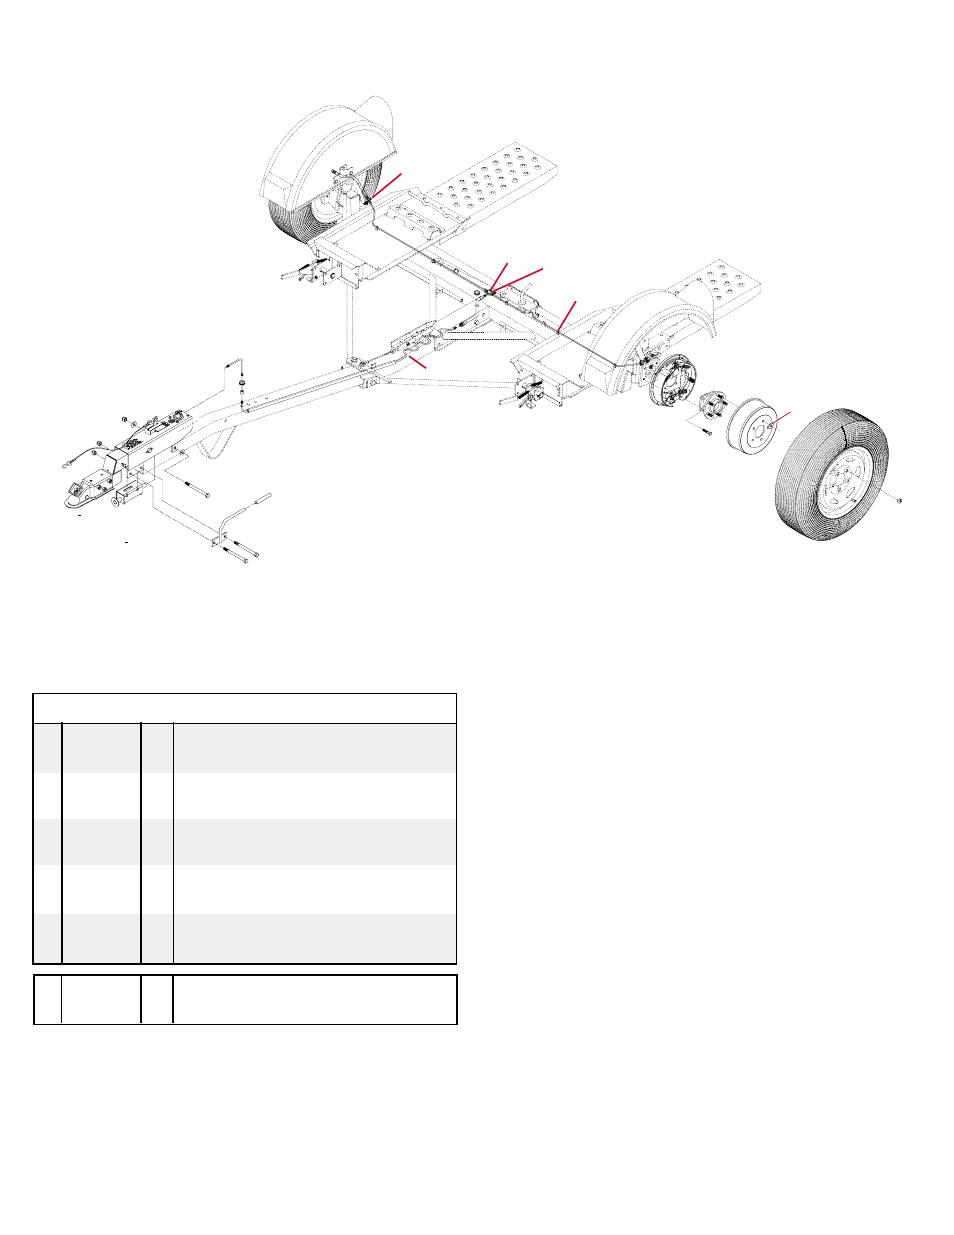 3 16 Brake Line >> Surge brakes parts breakdown, Surge brakes parts list, Bleeding the system | Demco Kar-Kaddy 3 ...